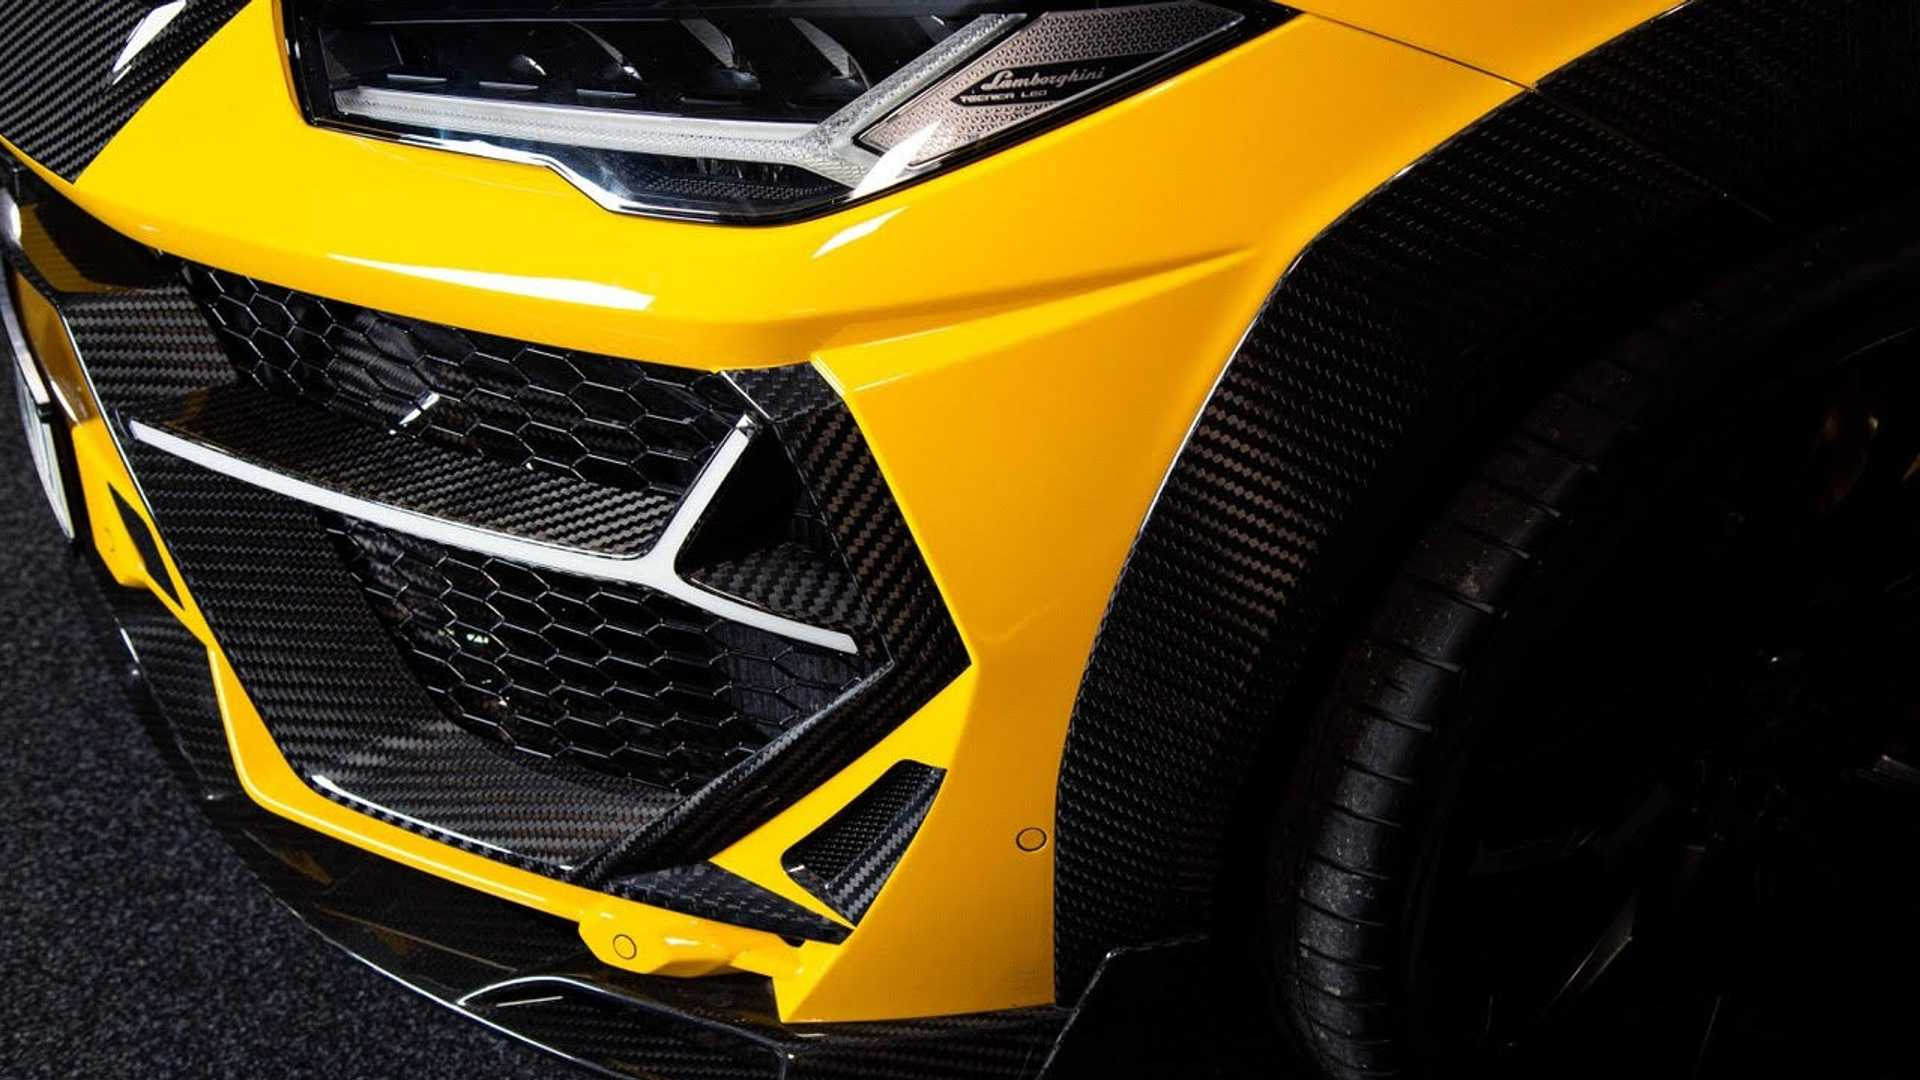 Lamborghini-Urus-by-Keyvany-9